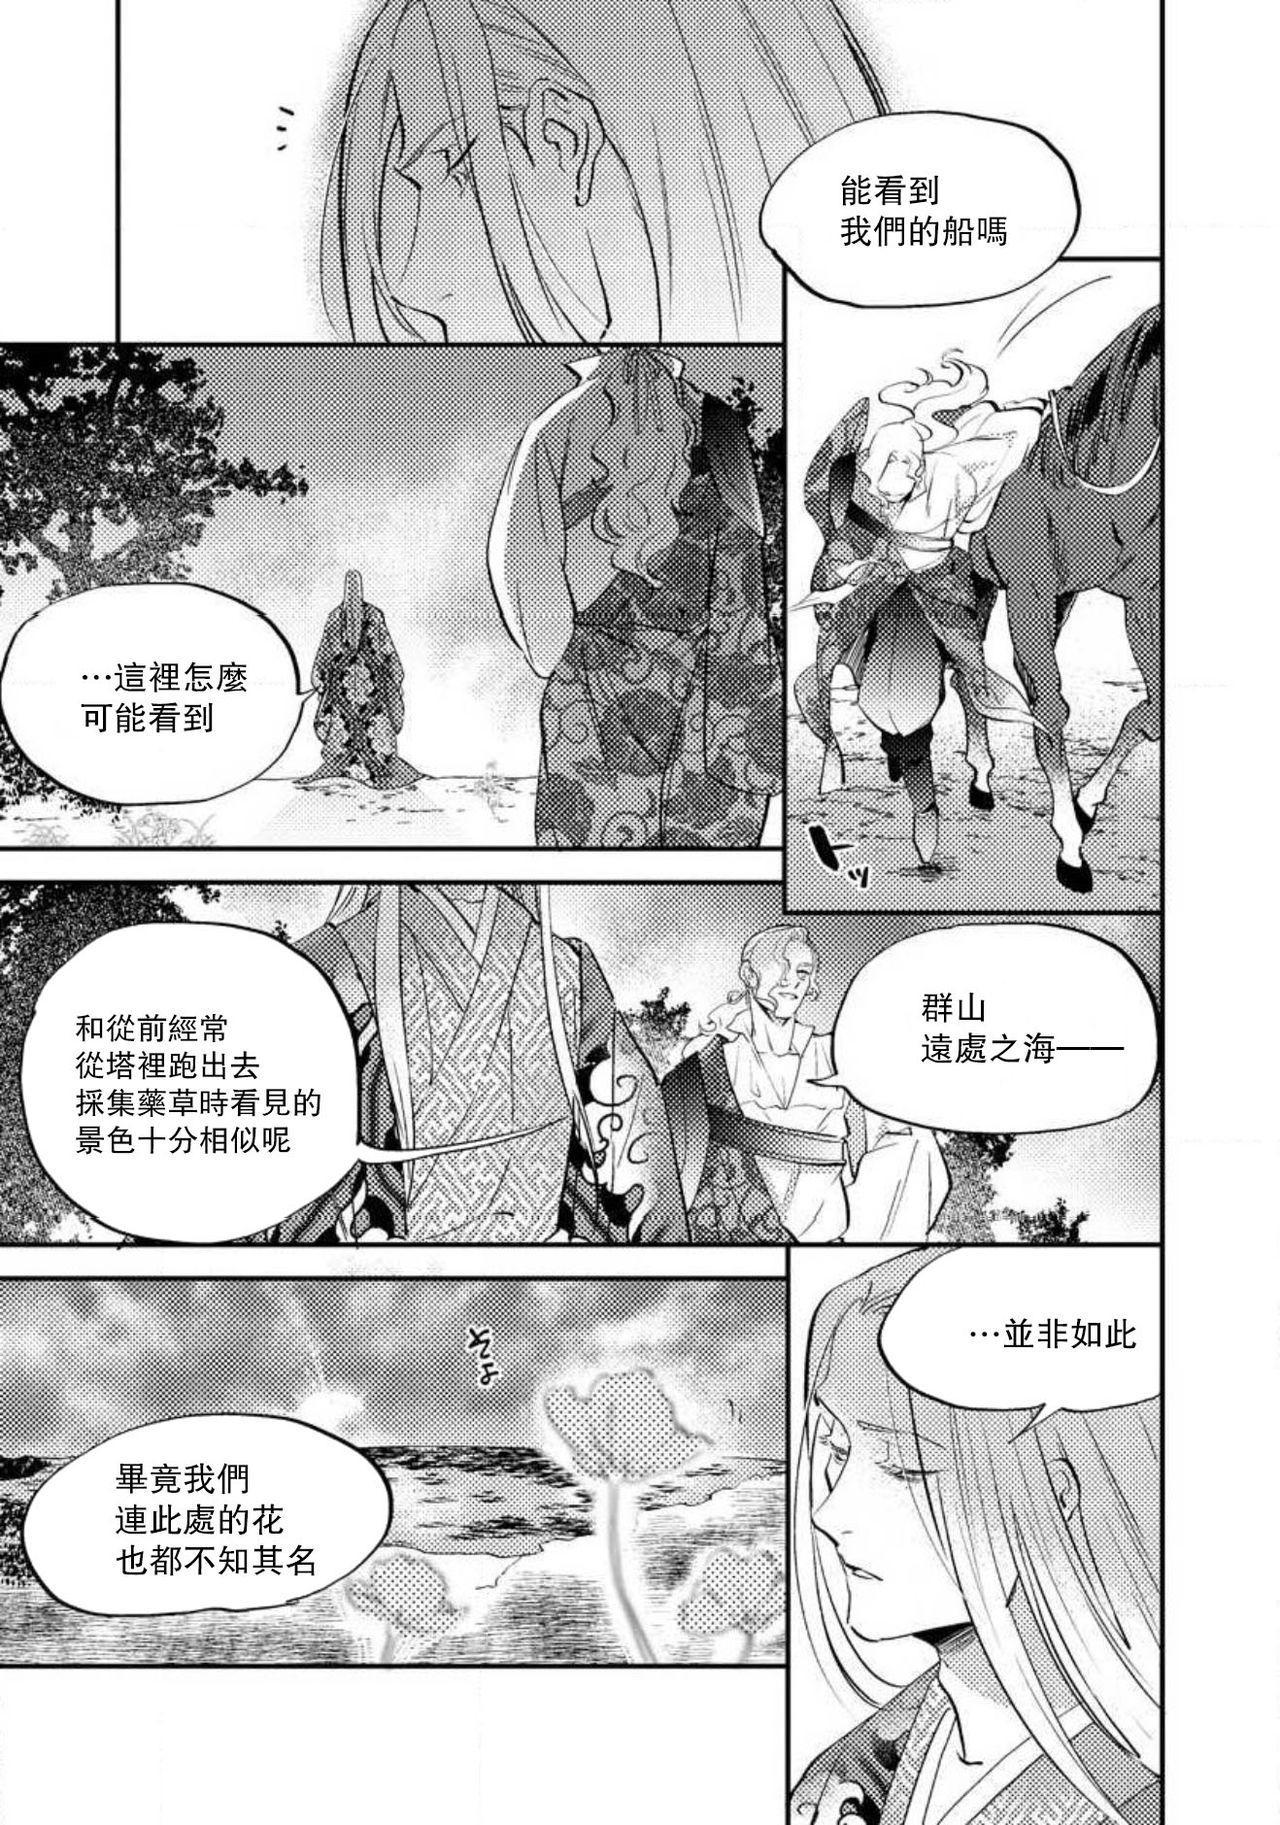 Oeyama suimutan utsukushiki oni no toraware hime | 大江山醉夢逸話 美麗的鬼與被囚禁的公主 Ch. 1-8 156